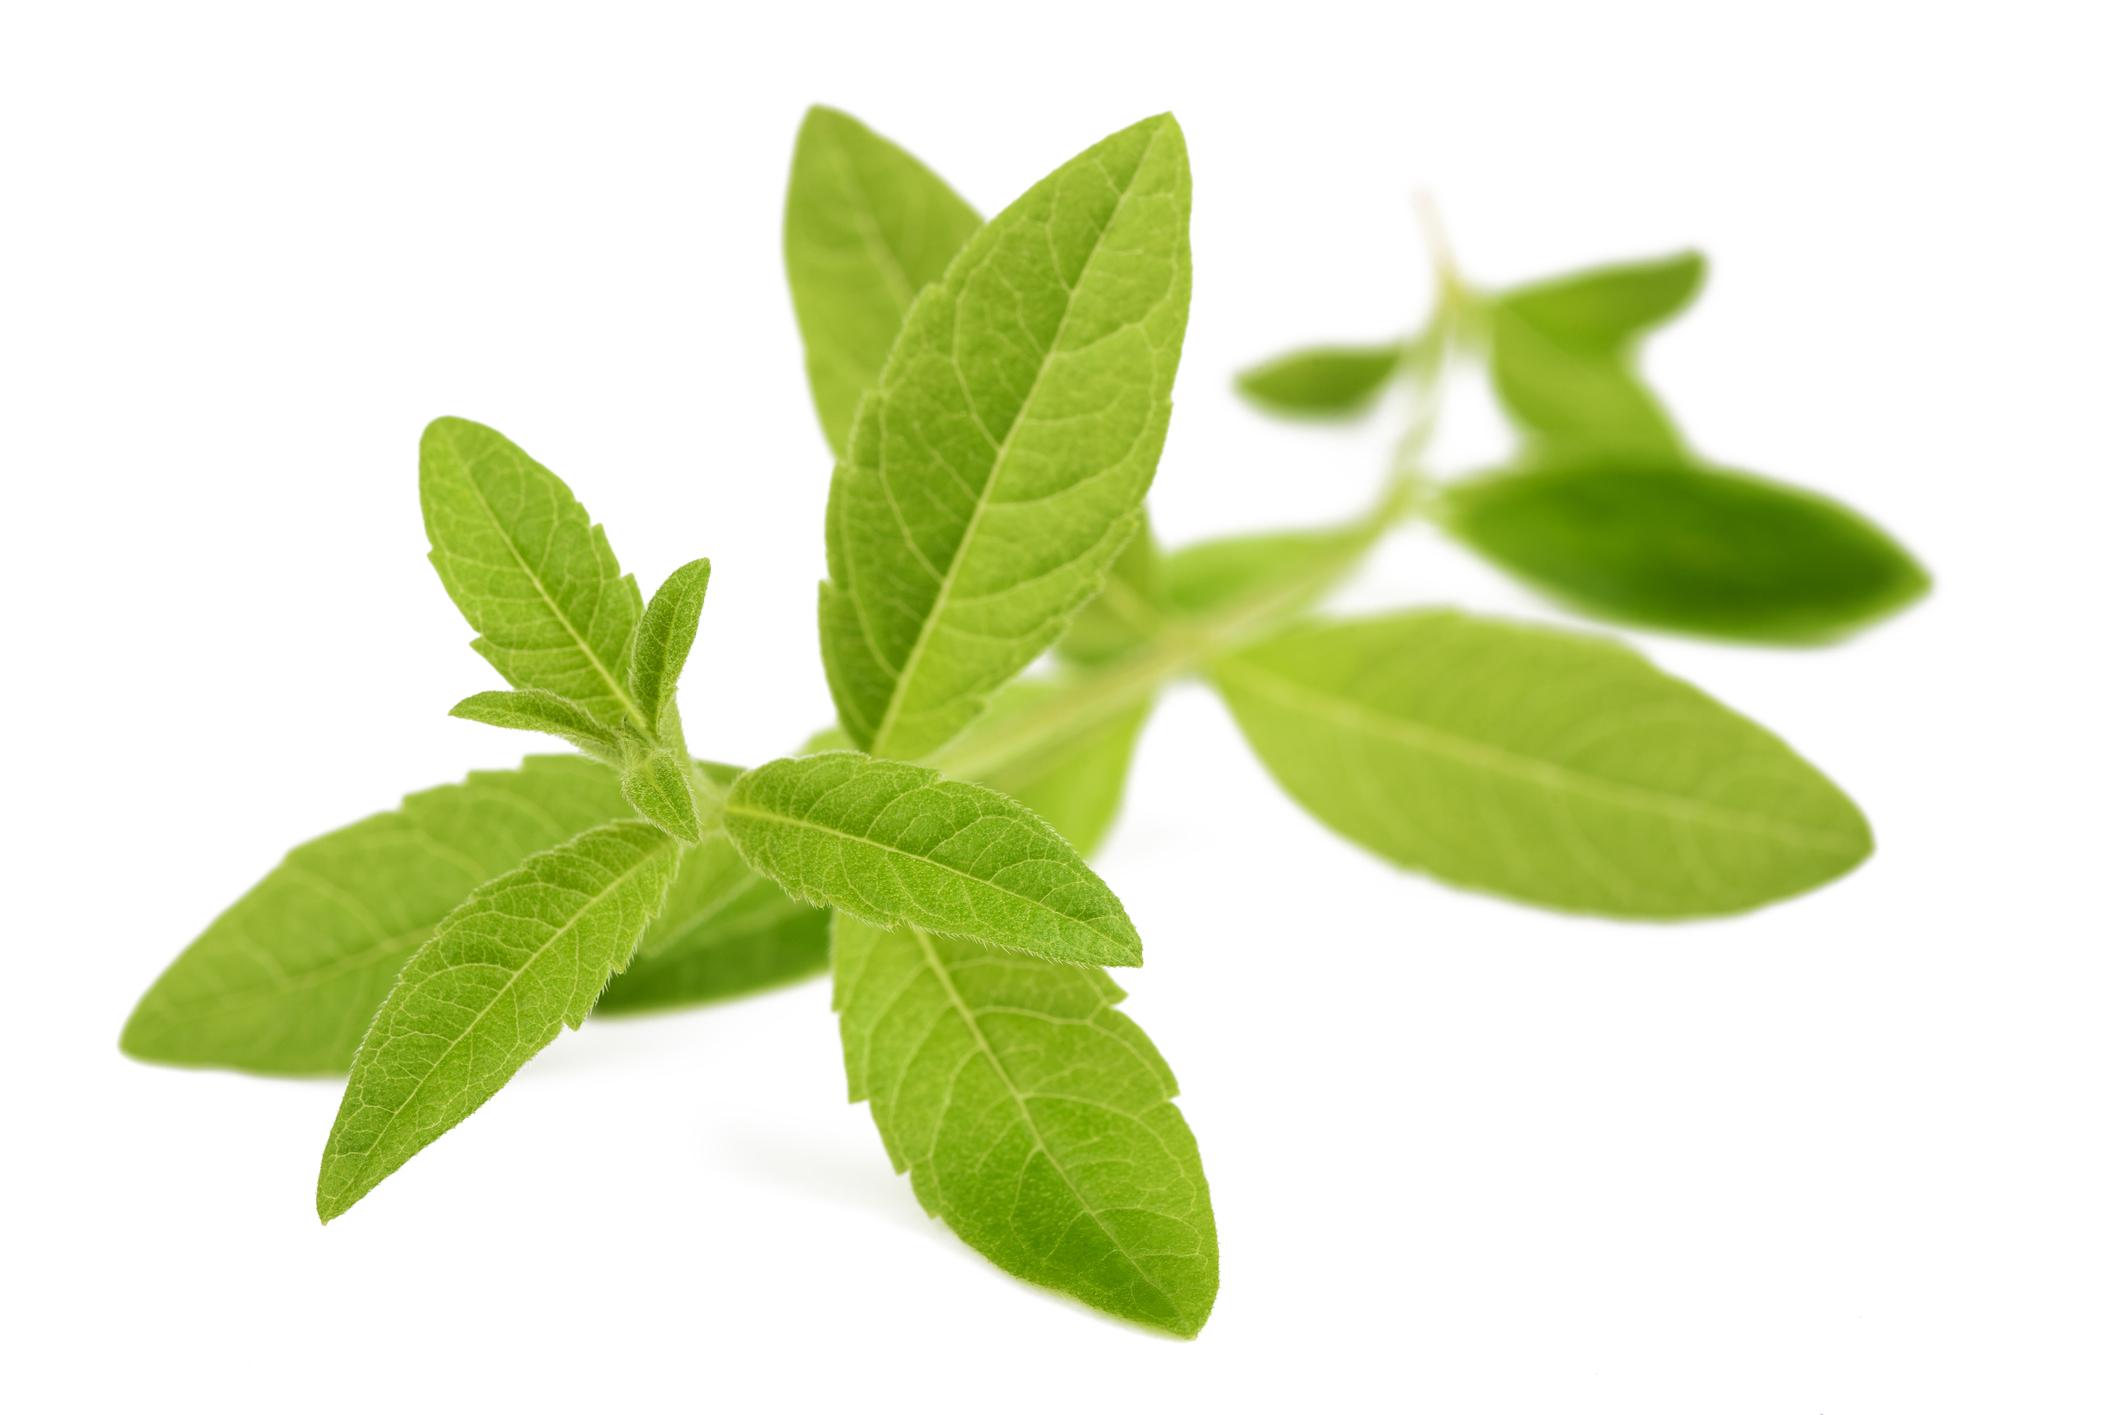 La verveine odorante, produits cosmétique